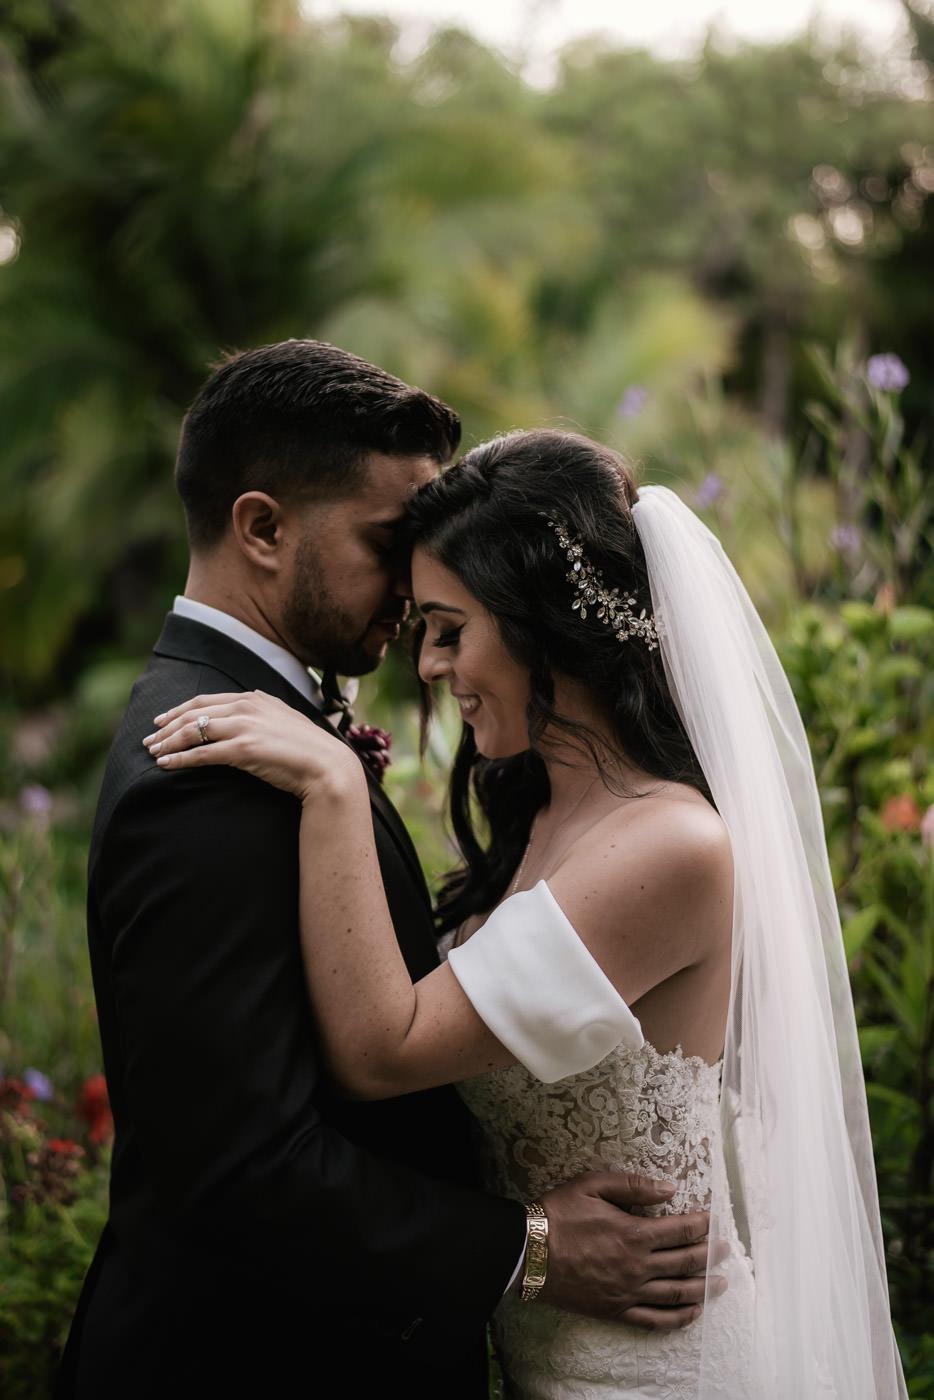 eden-gardens-wedding-photographer-romantic-77.jpg